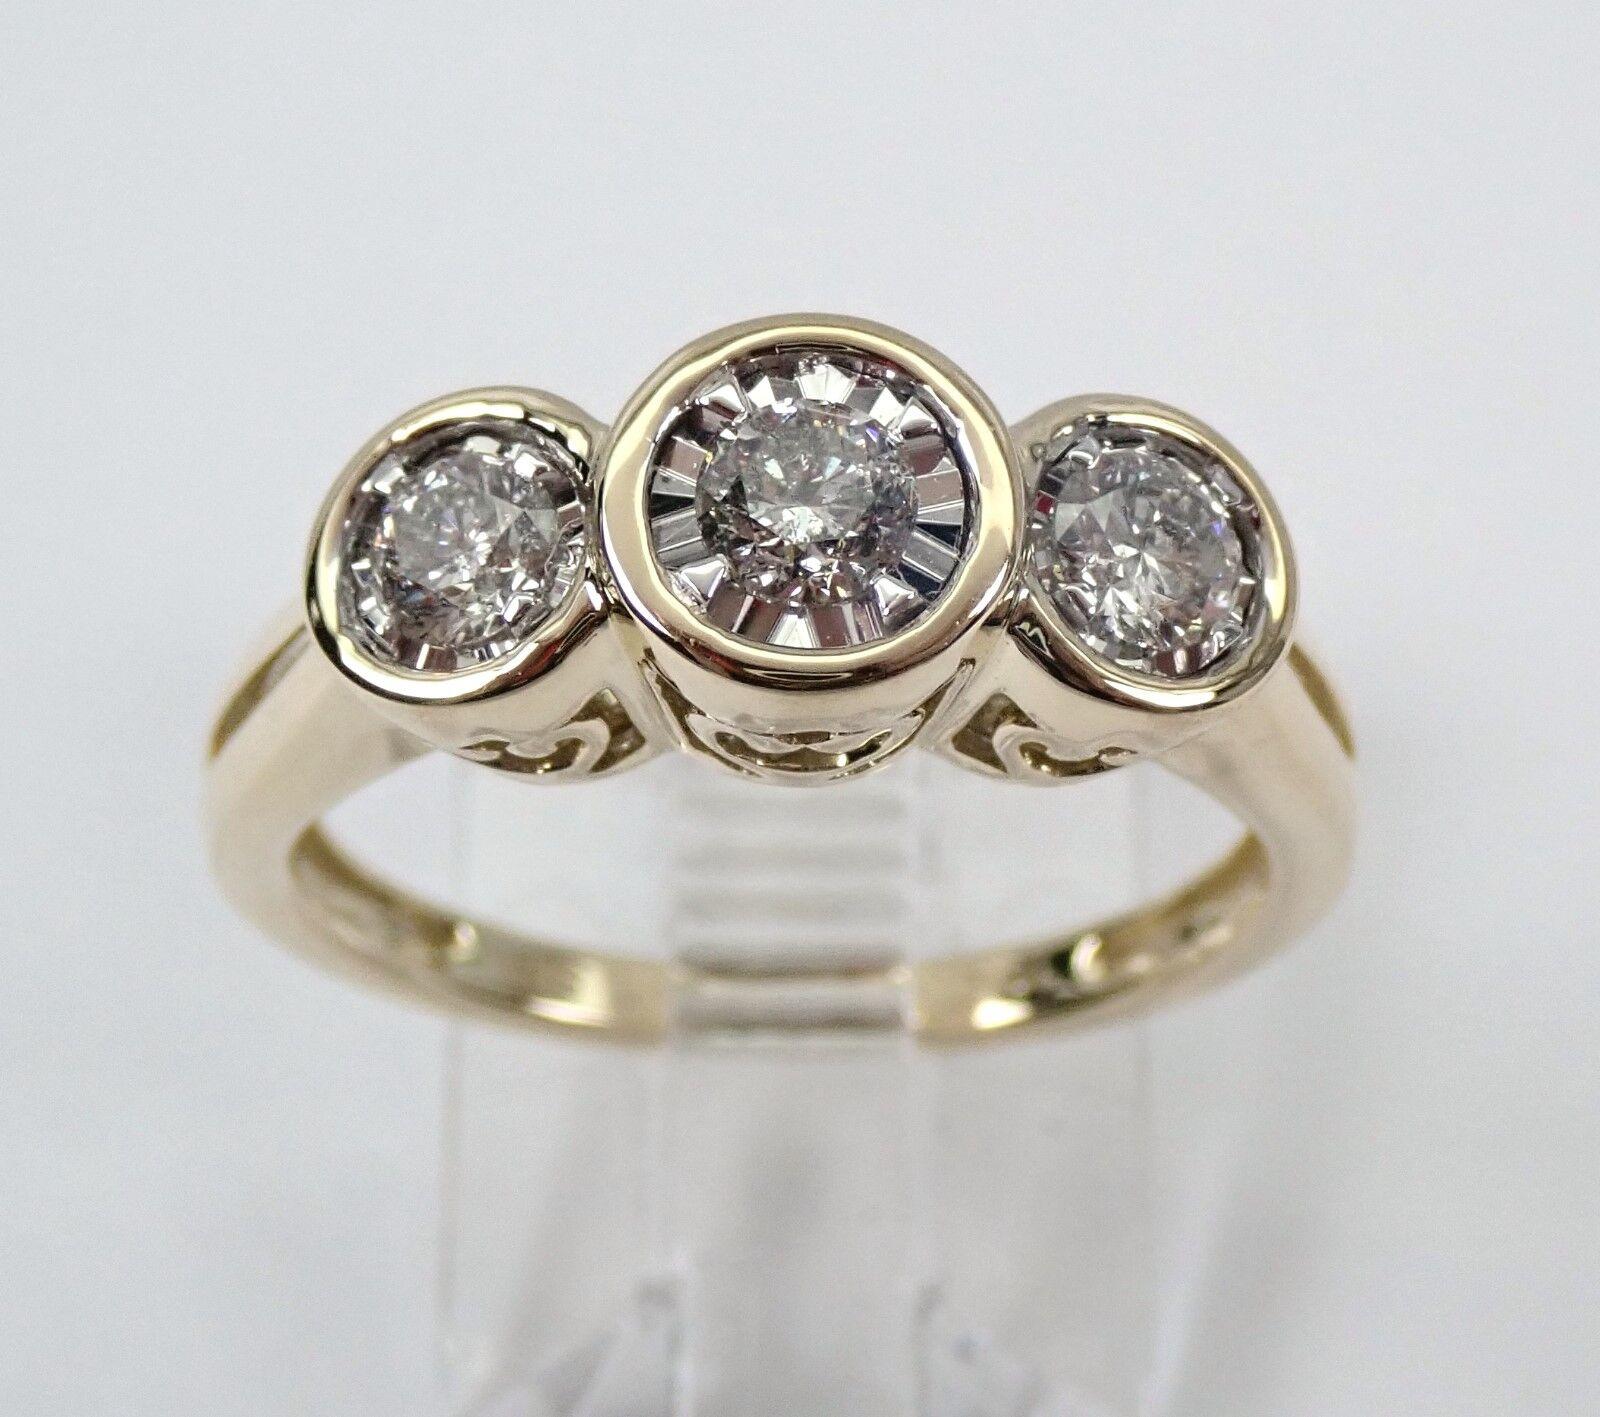 Yellow gold 3-Stone Diamond Engagement Ring Bezel Set Size 7 Past Present Future